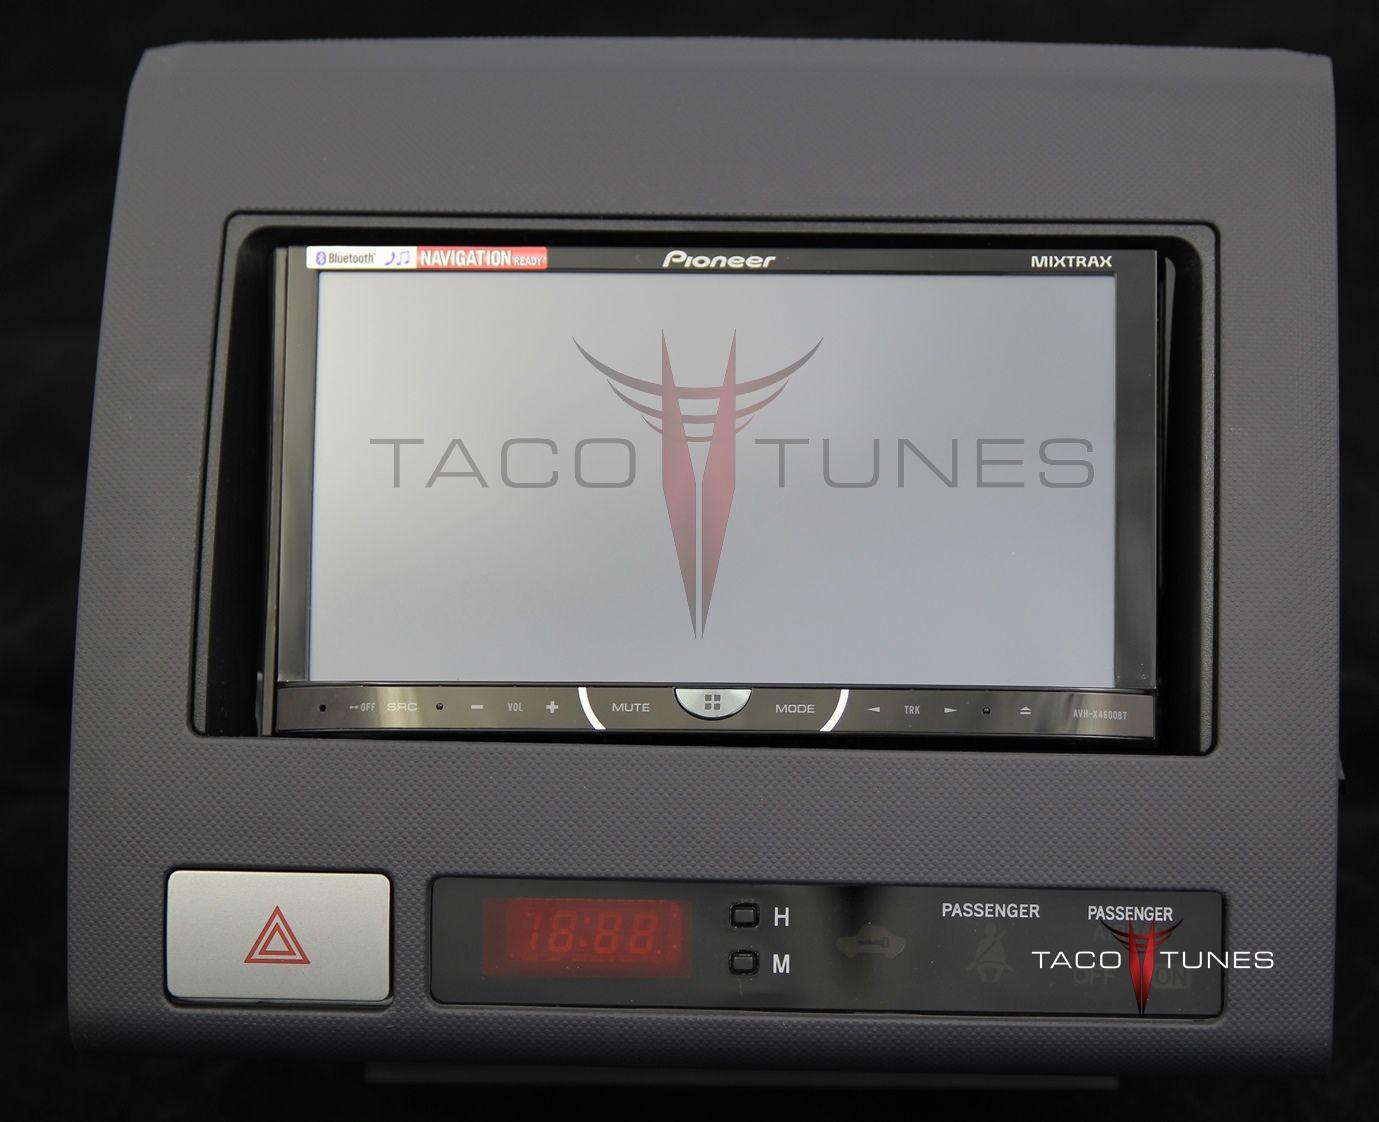 2005 2011 toyota tacoma aftermarket stereo installation kit. Black Bedroom Furniture Sets. Home Design Ideas